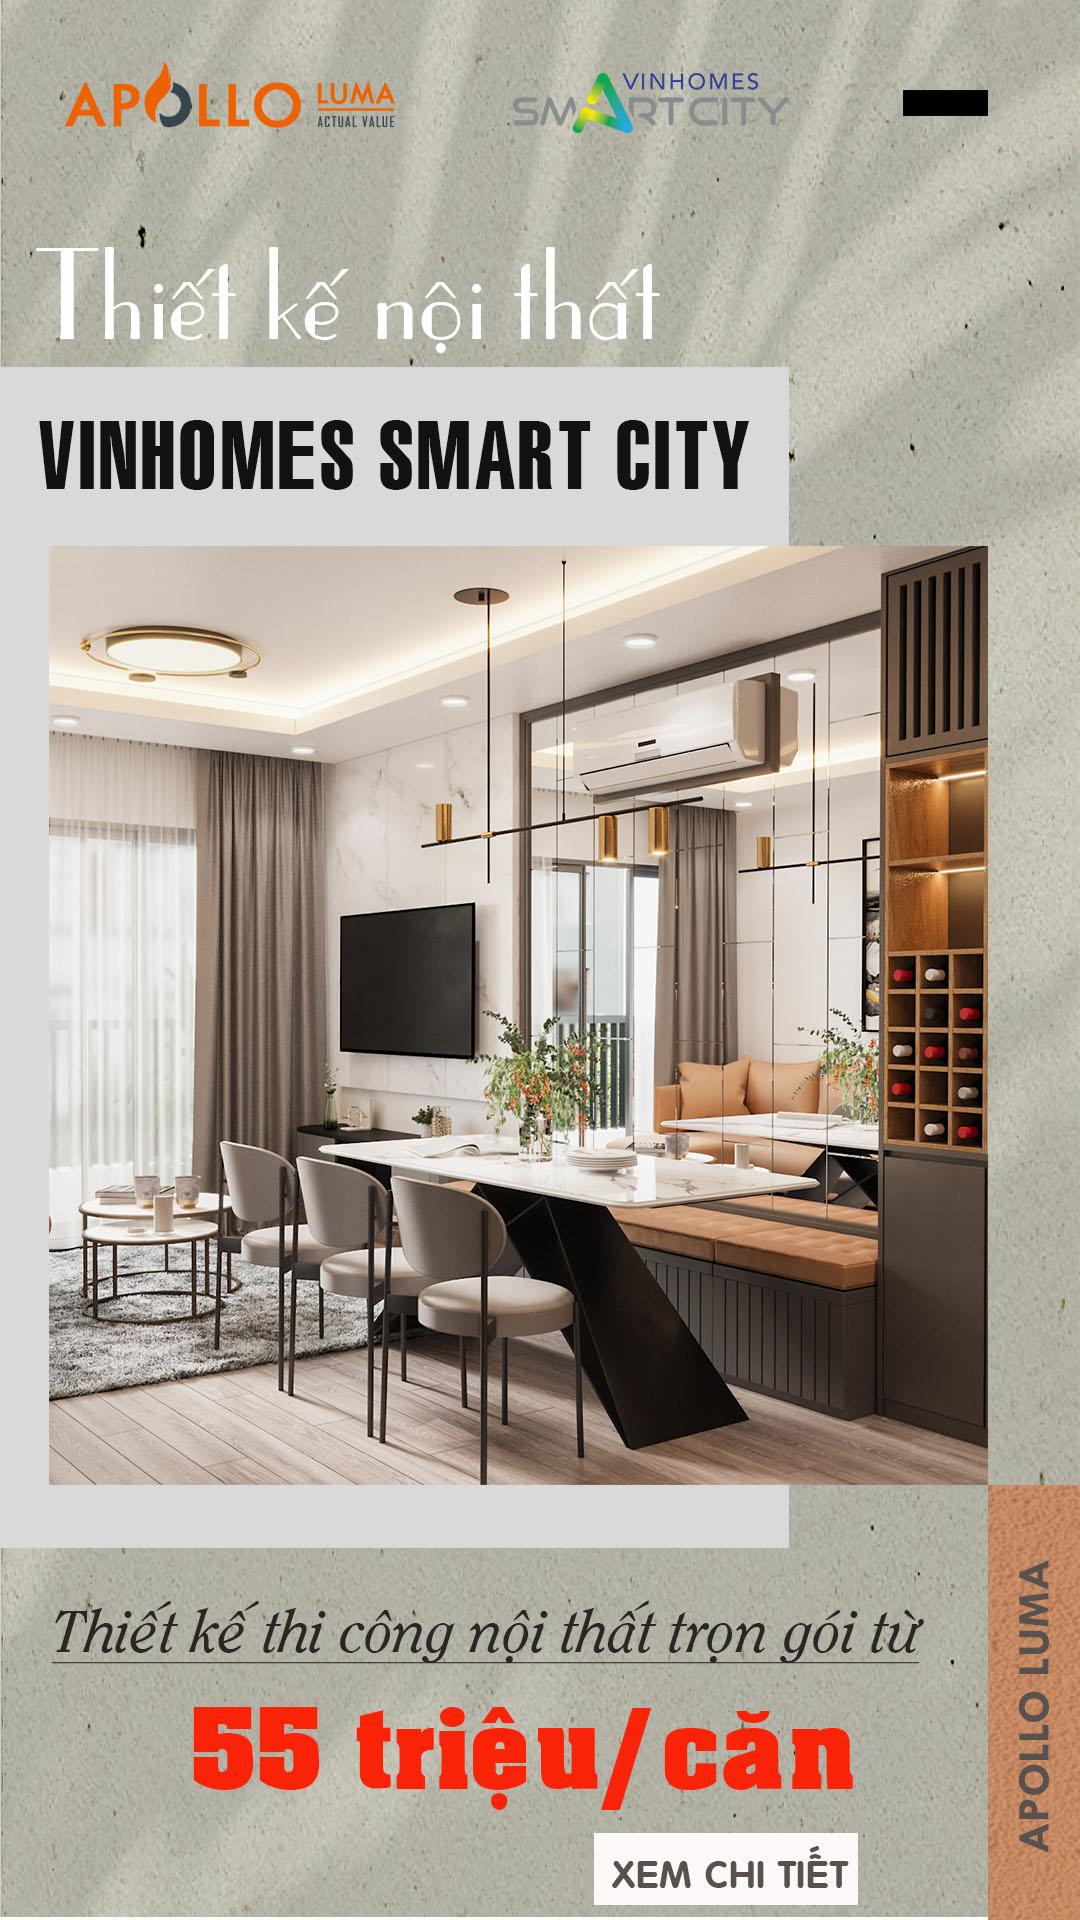 thiết kế nội thất vinhomes smart city